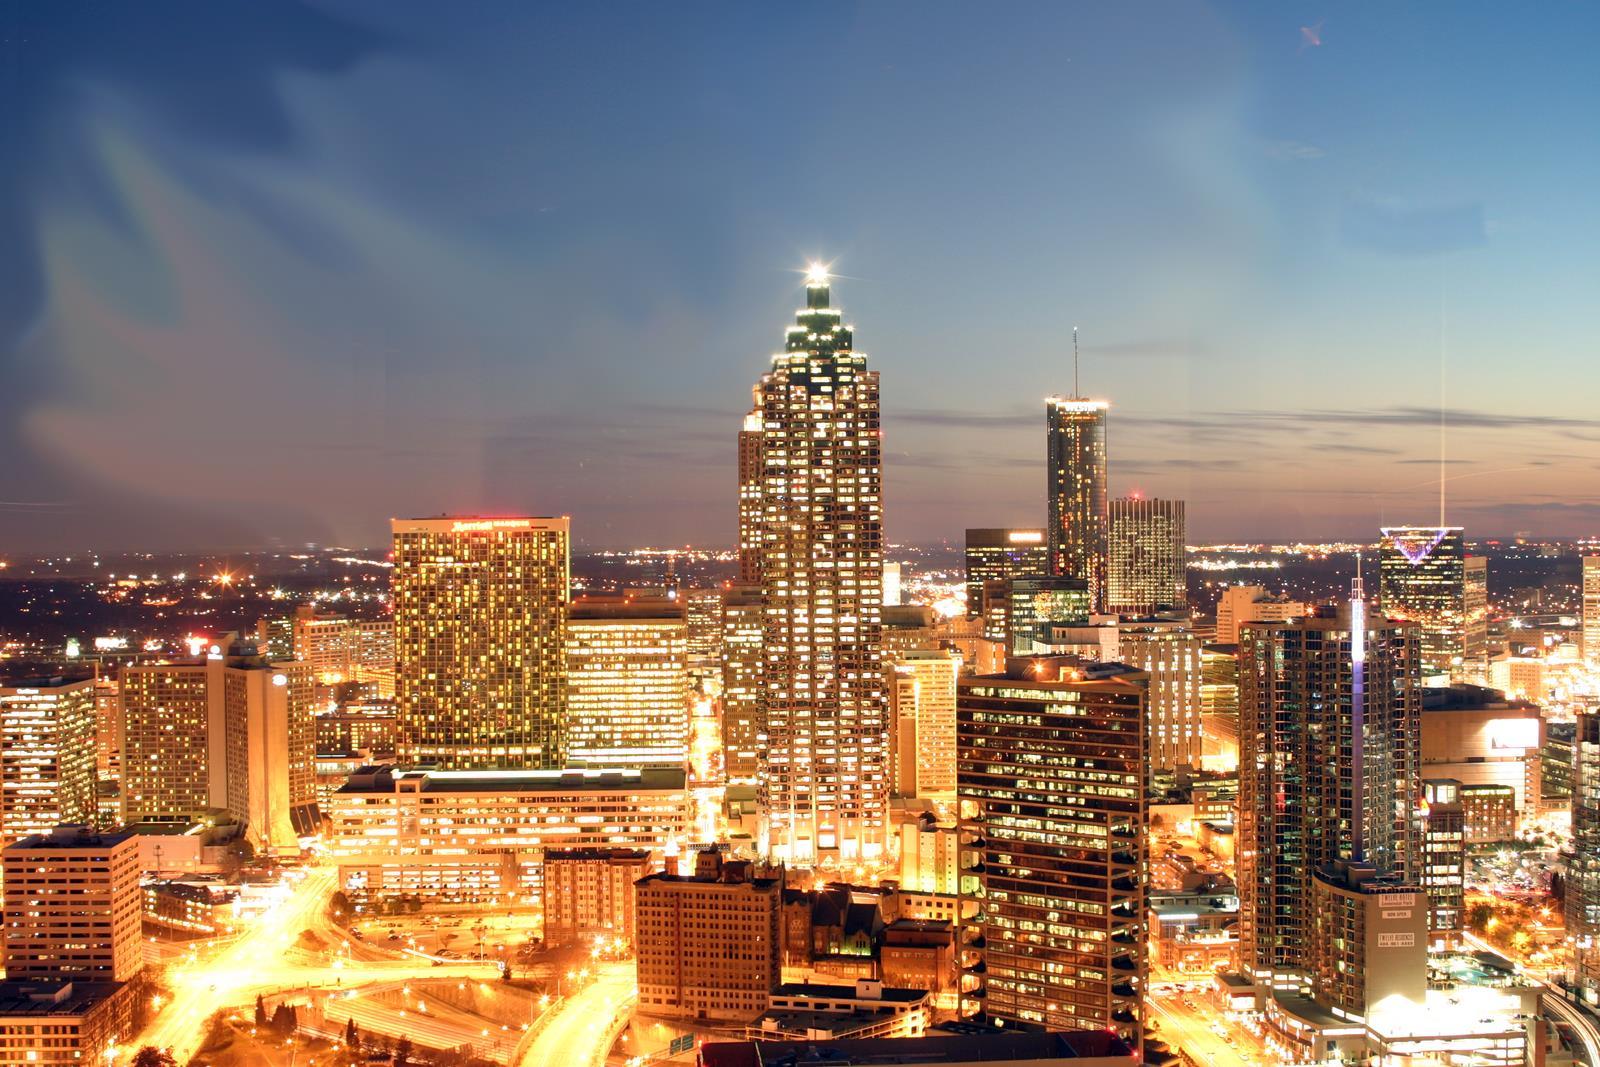 Students Can Look Forward to Fun in Atlanta